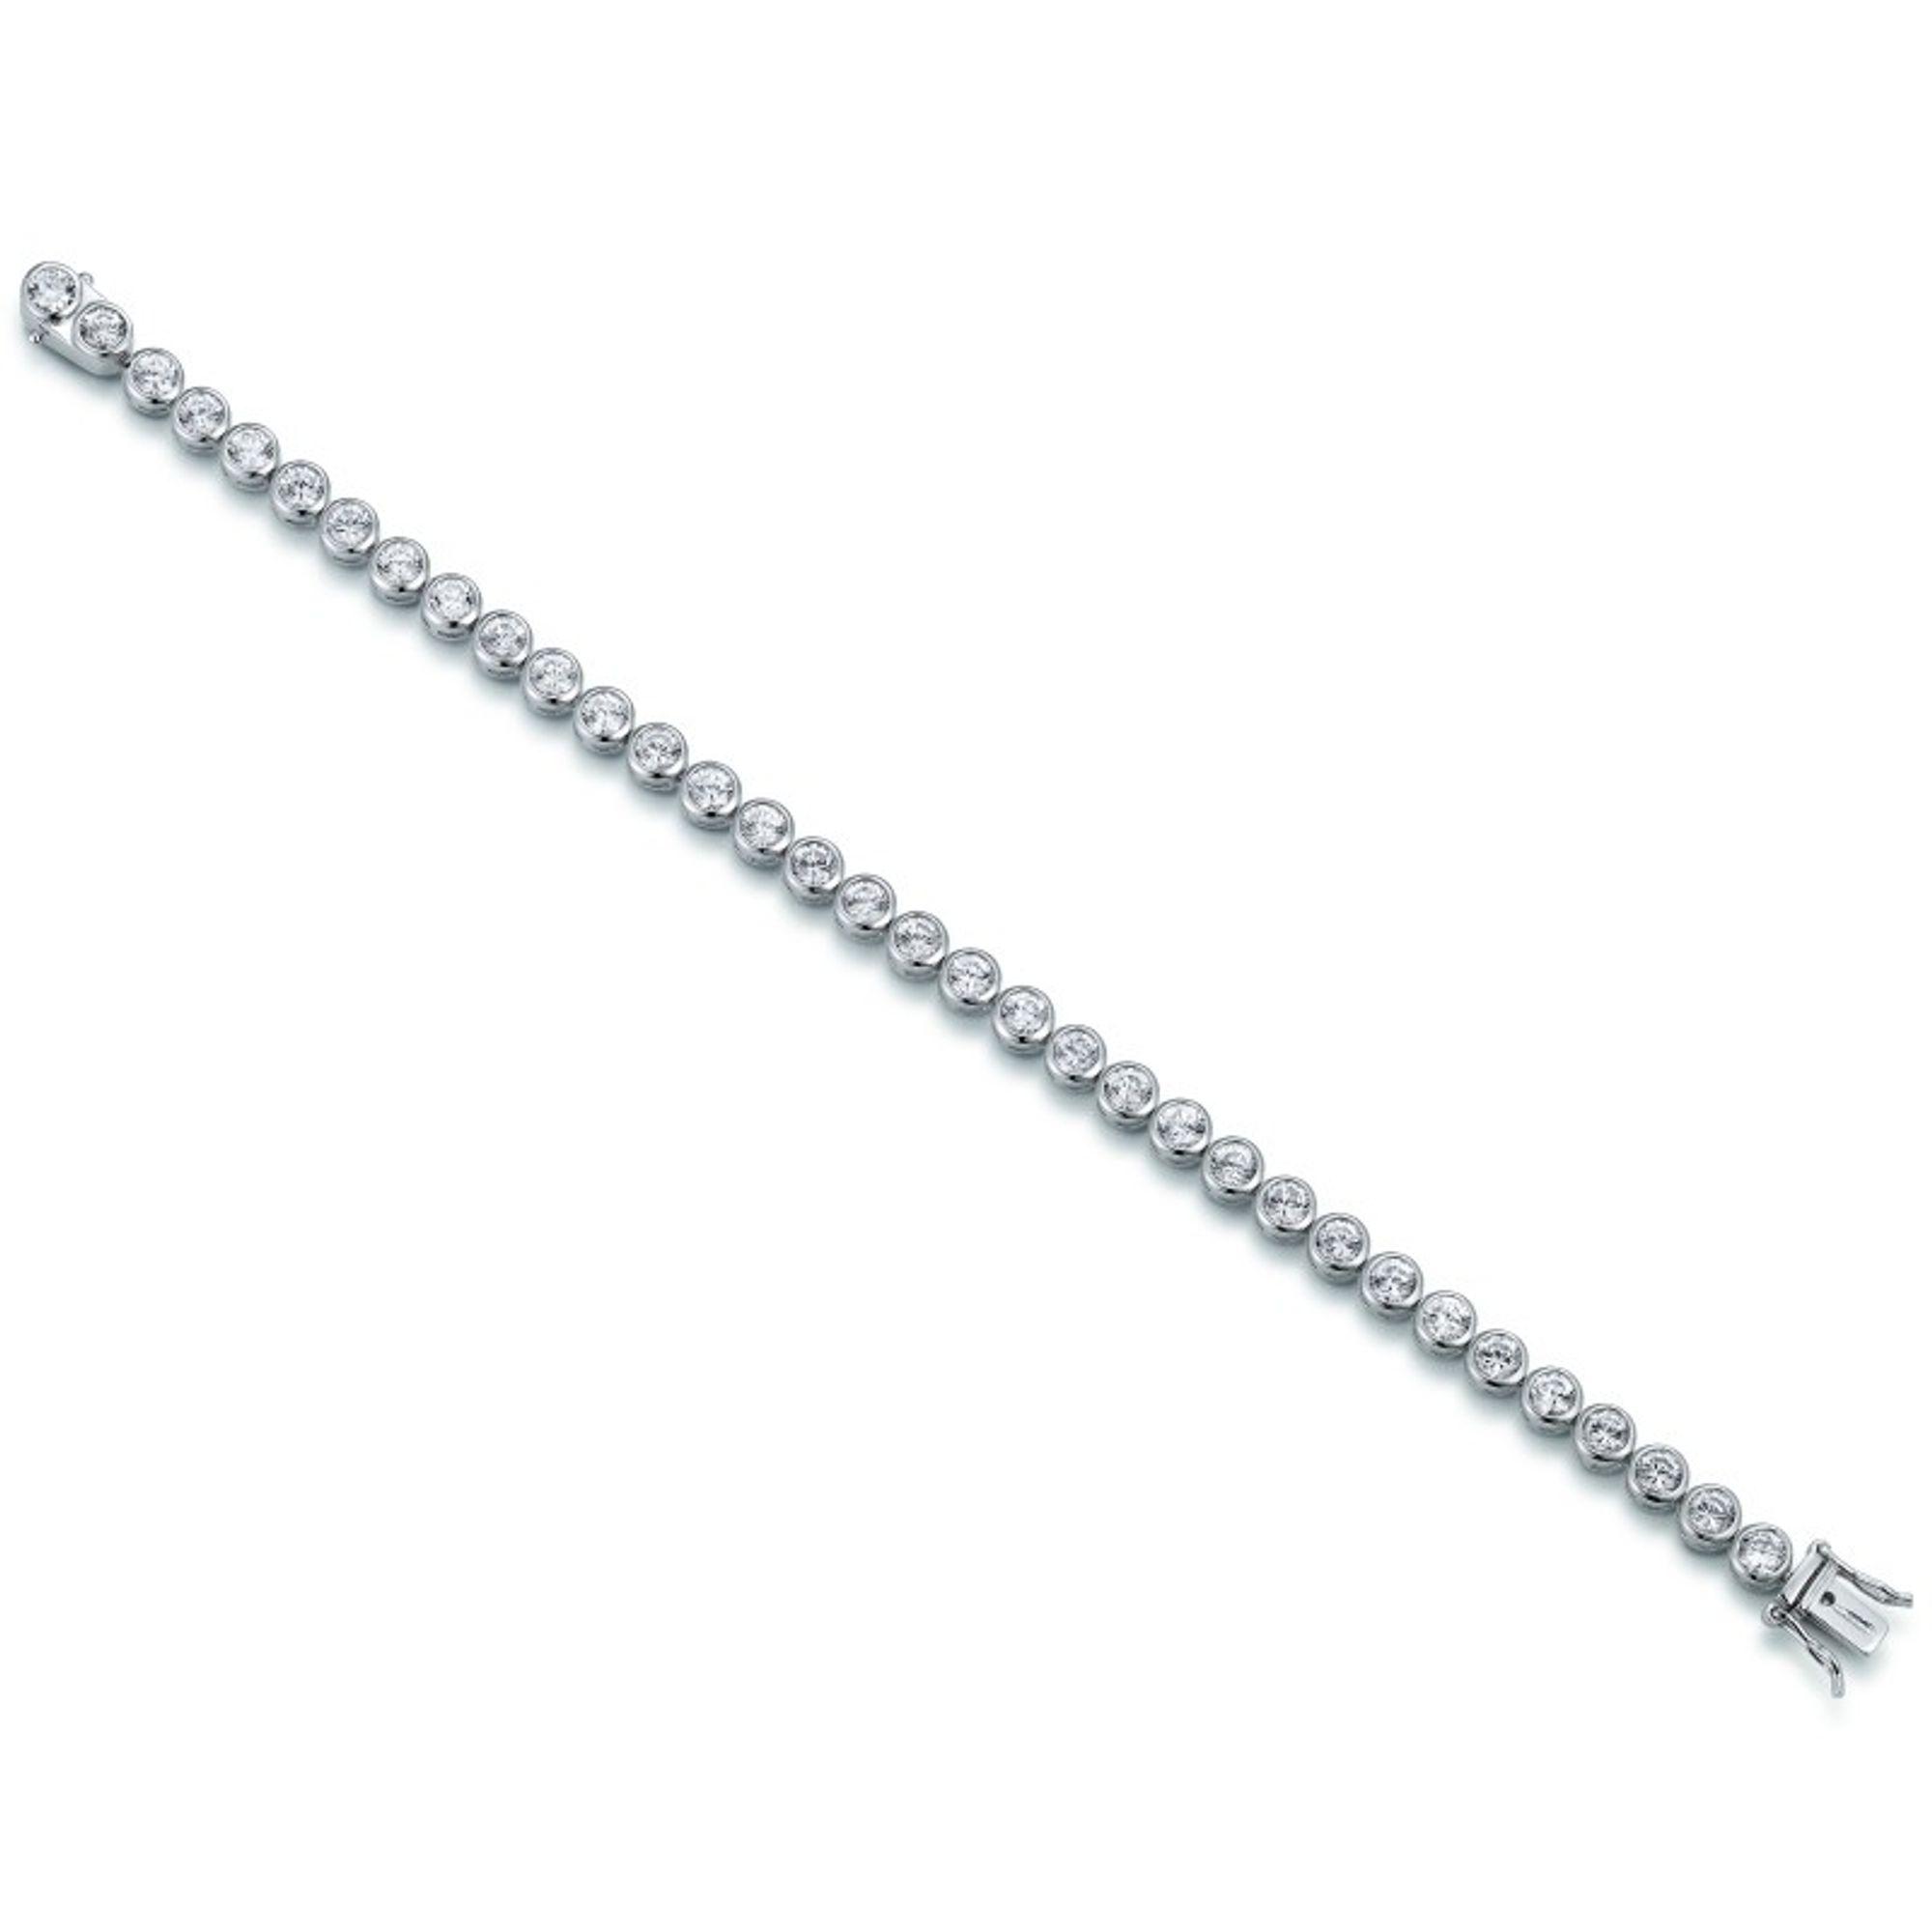 GOOIX 914-1036 Damen Armband Silber Zirkonia Weiß 17 cm